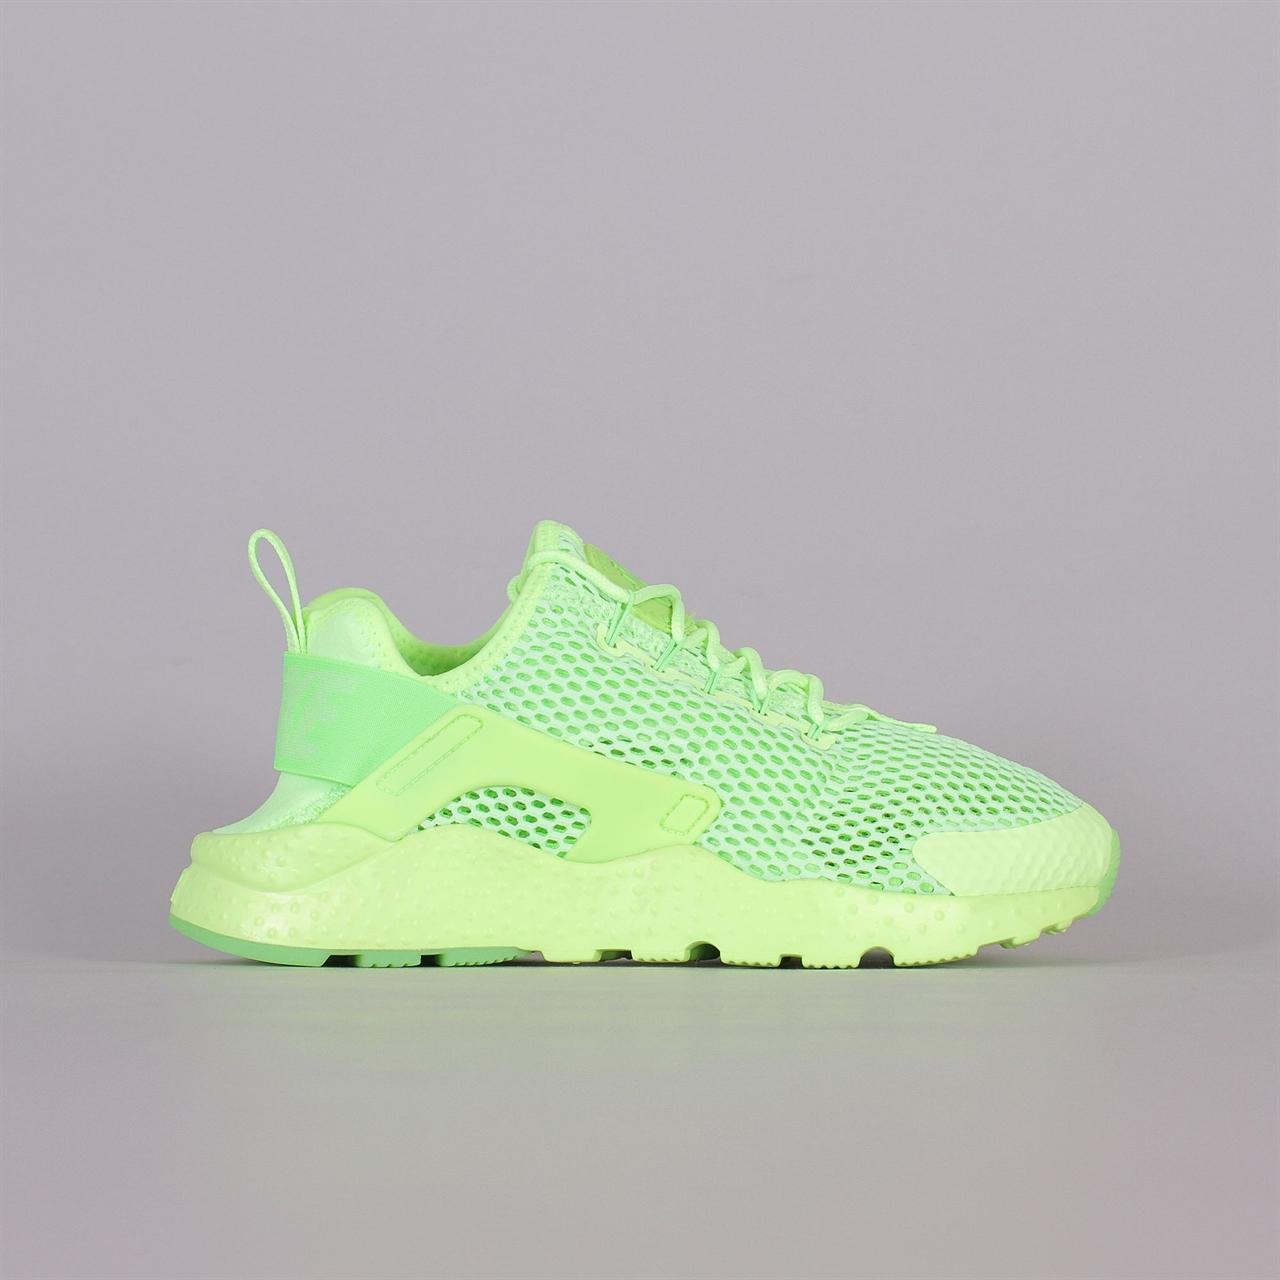 separation shoes aad3a 23568 nike sportswear womens air huarache run ultra breeze 833292